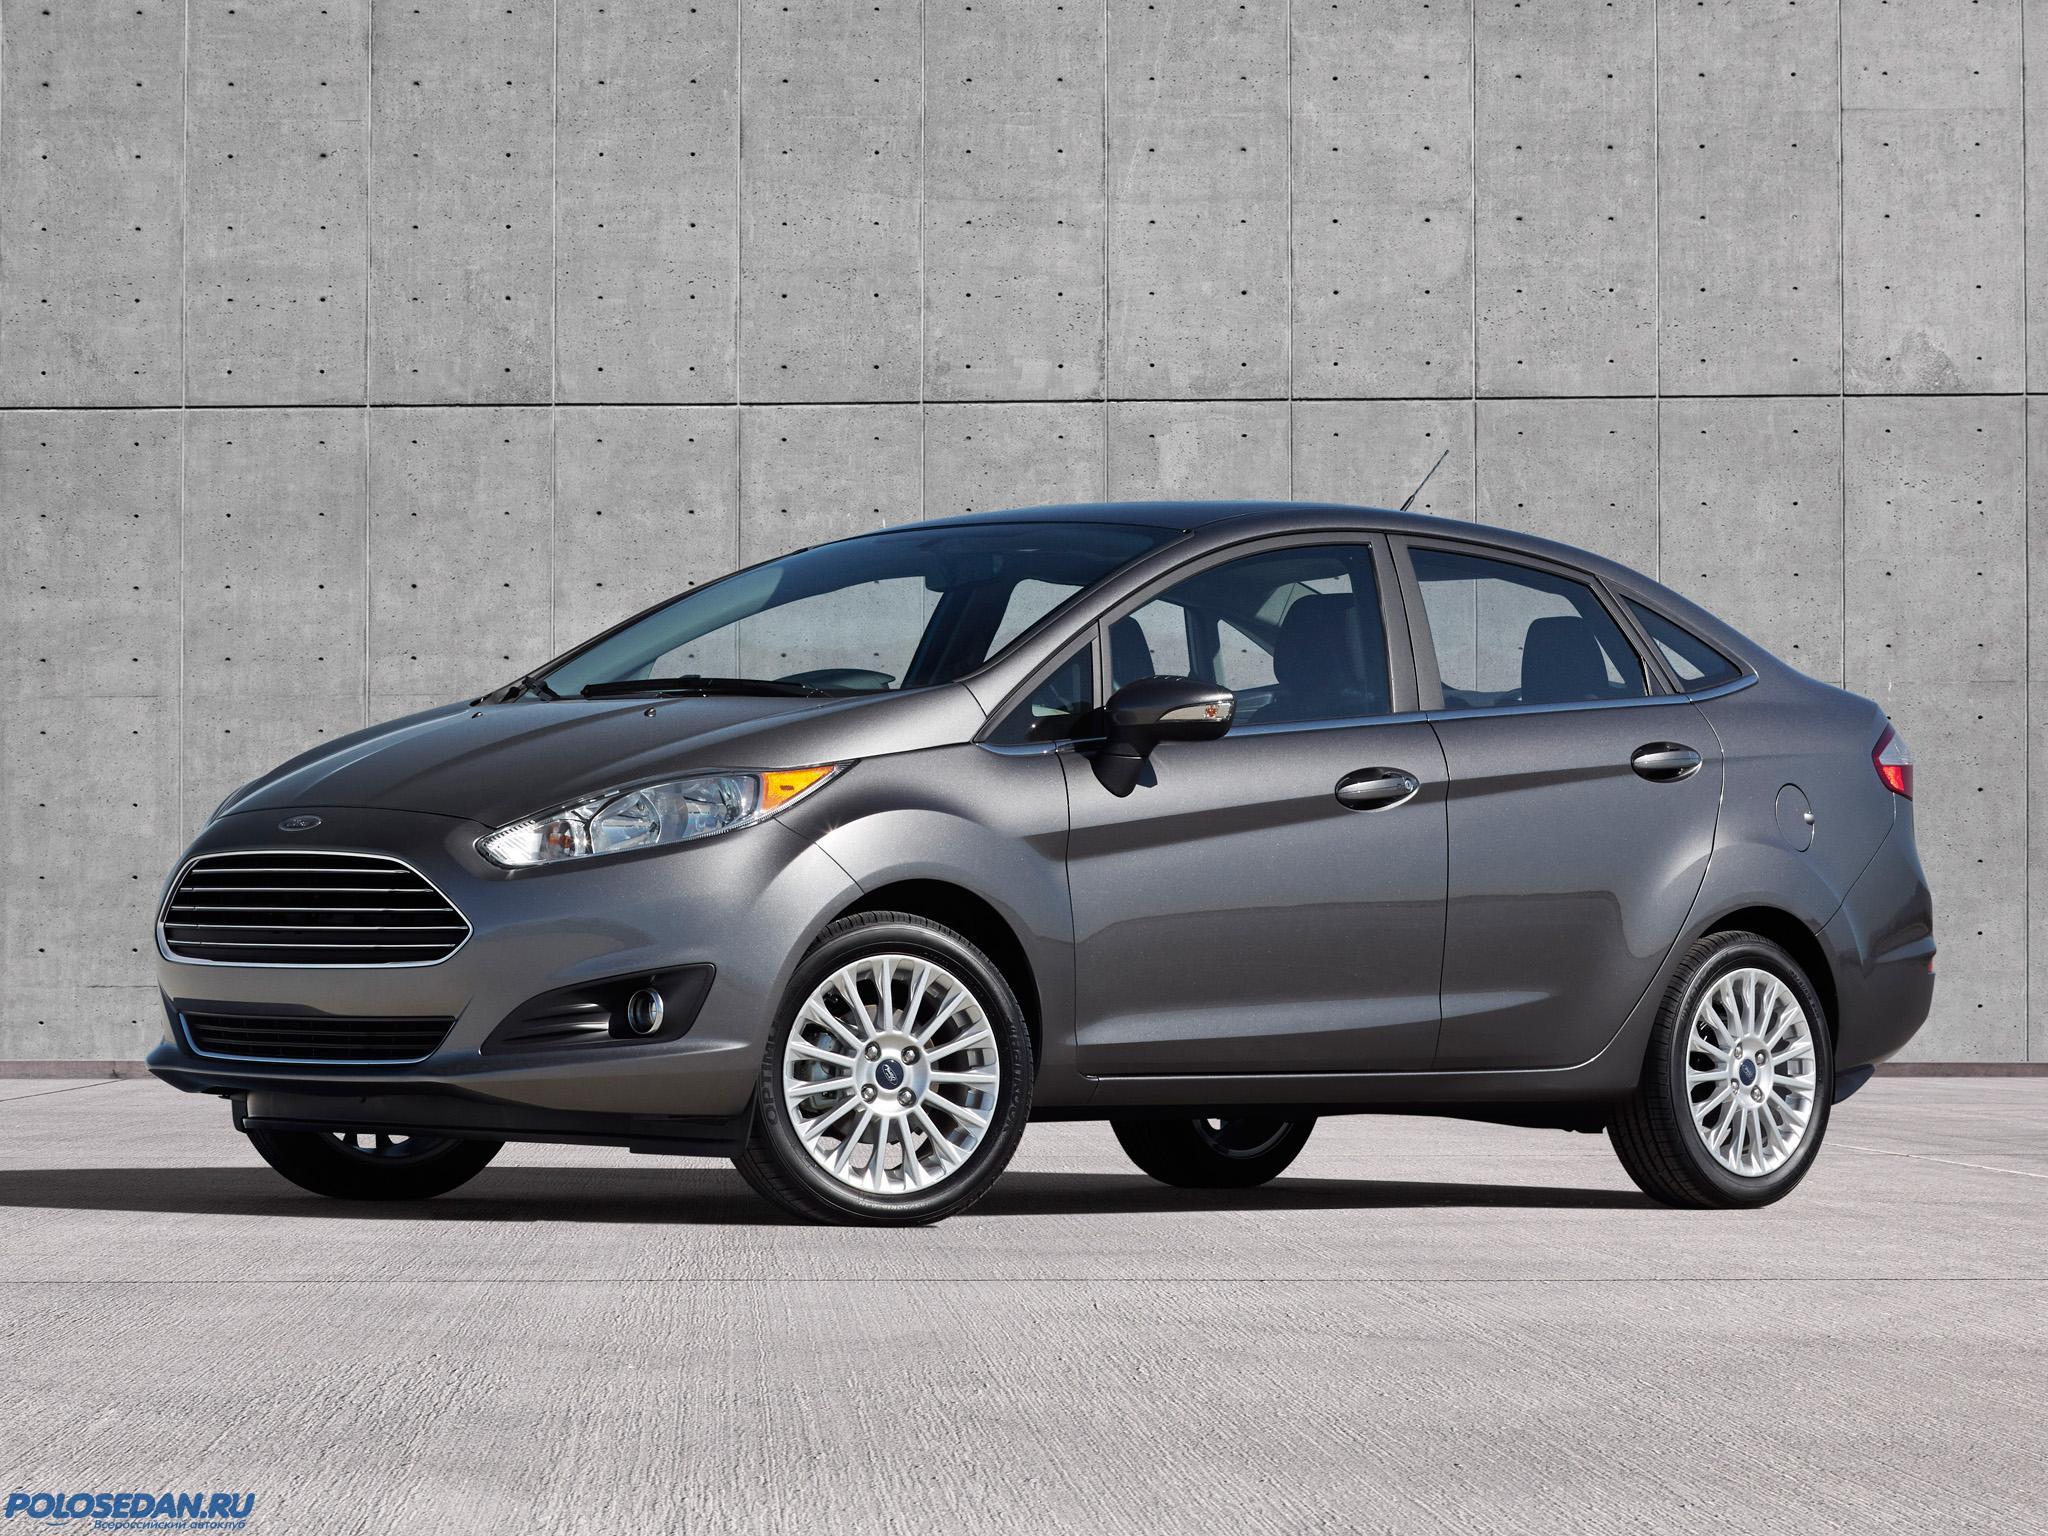 Ford Fiesta Sedan - конкурент ли Volkswagen Polo седан ?